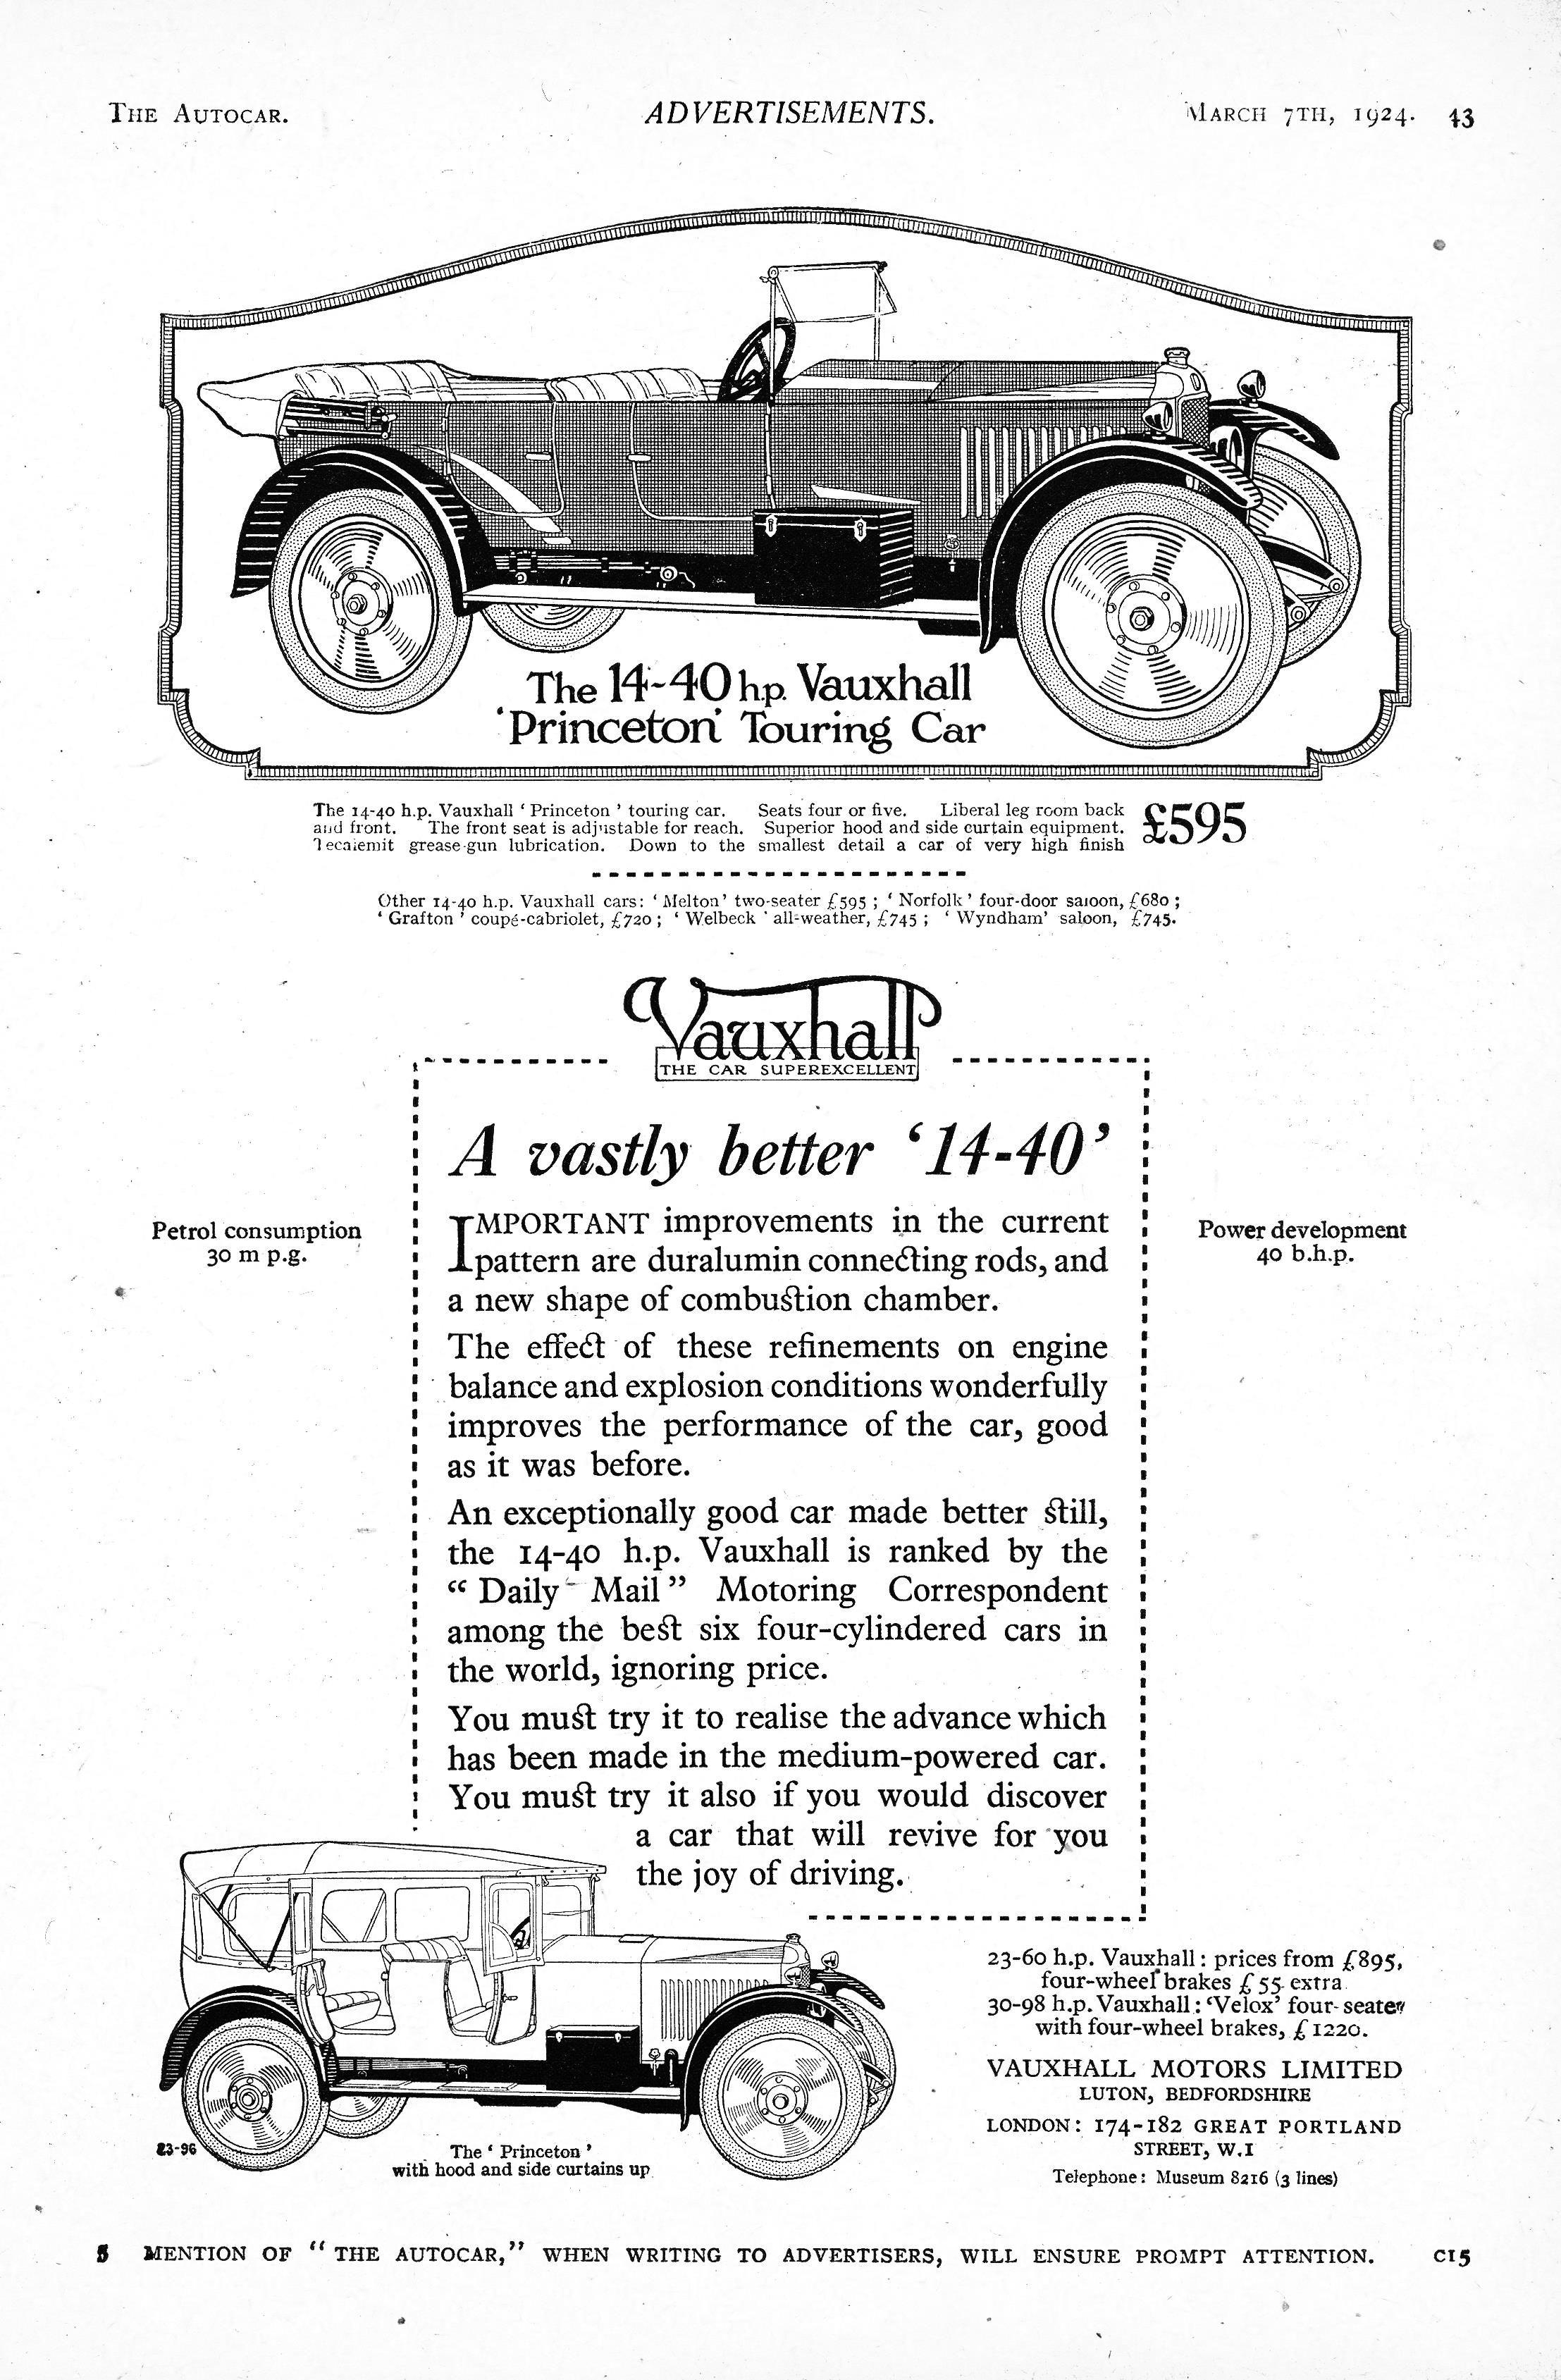 vauxhall 14 40 motor car autocar advert